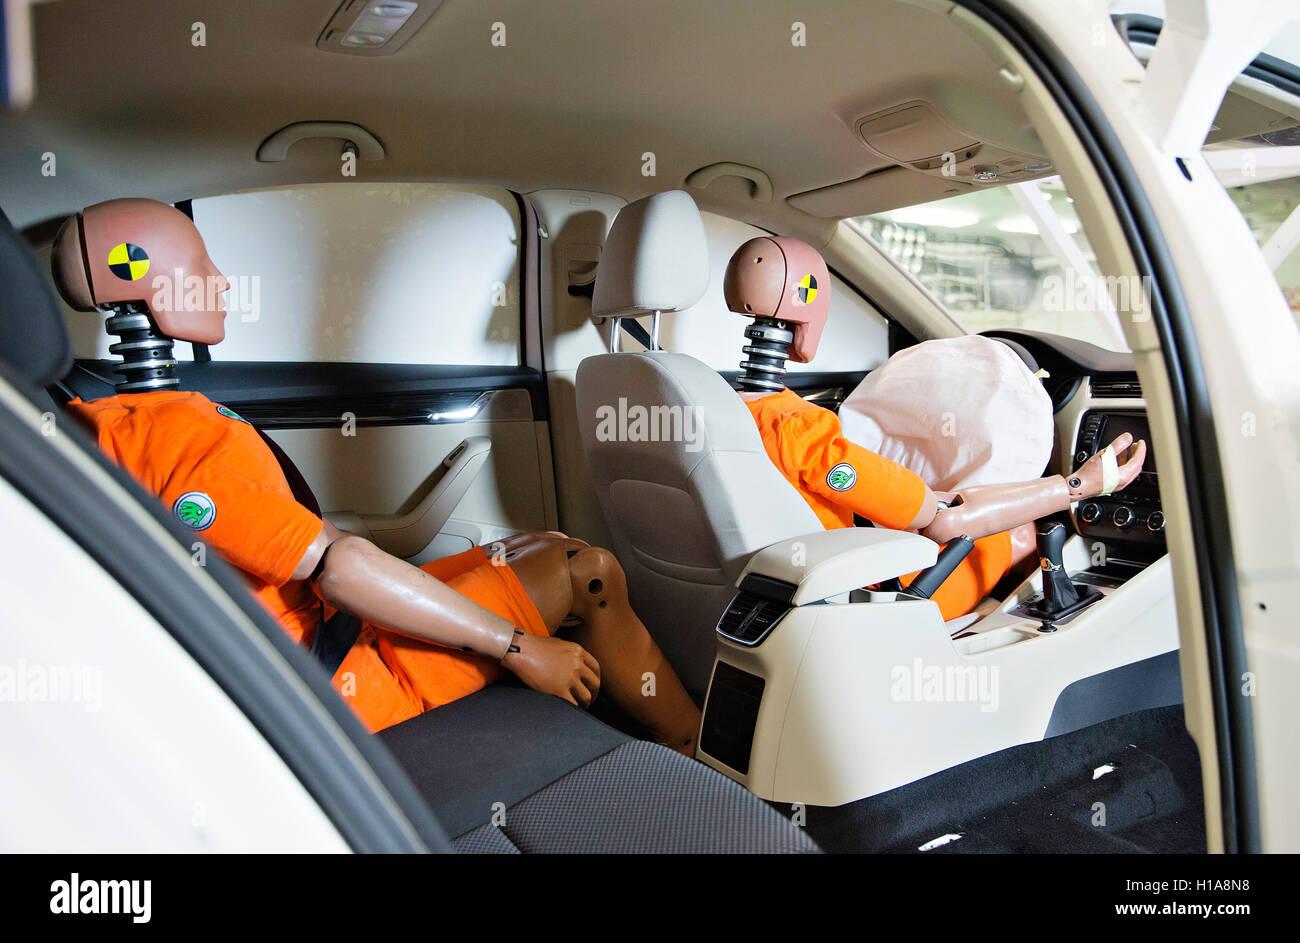 Skoda Auto Sled Test Crash Dummy Oscar Seat Belts Usage Safety